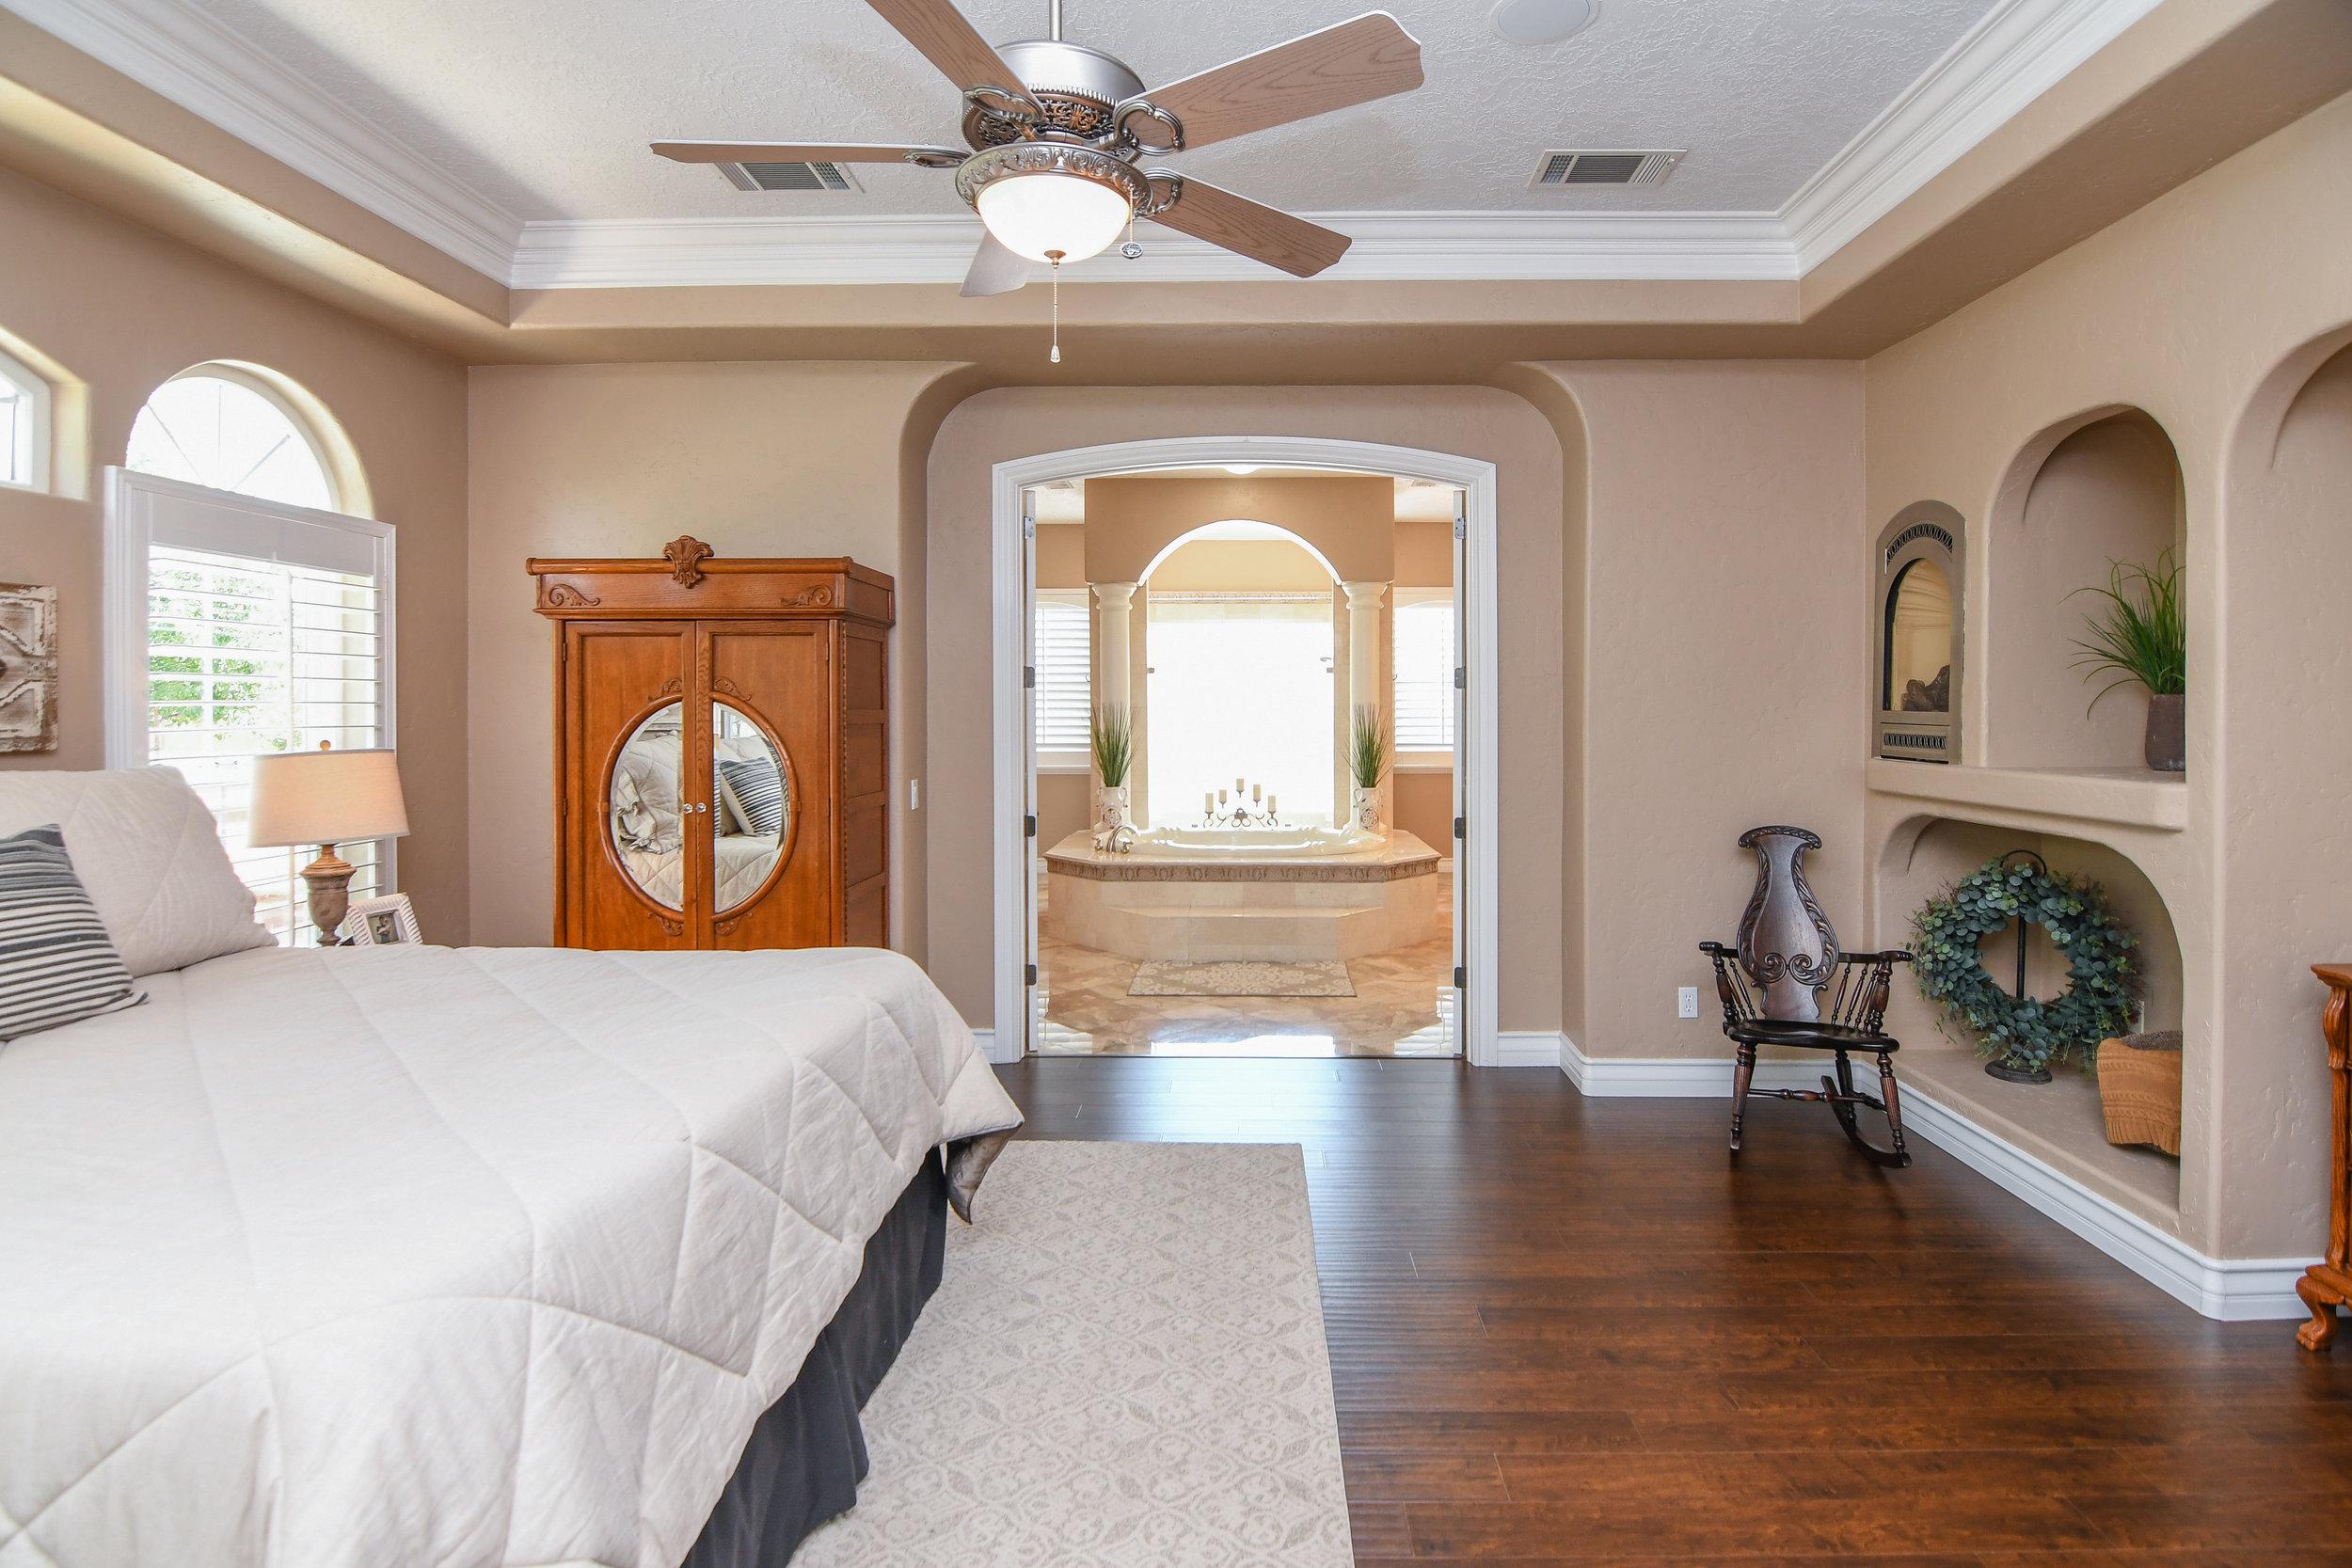 46 - Master Bedroom.jpeg